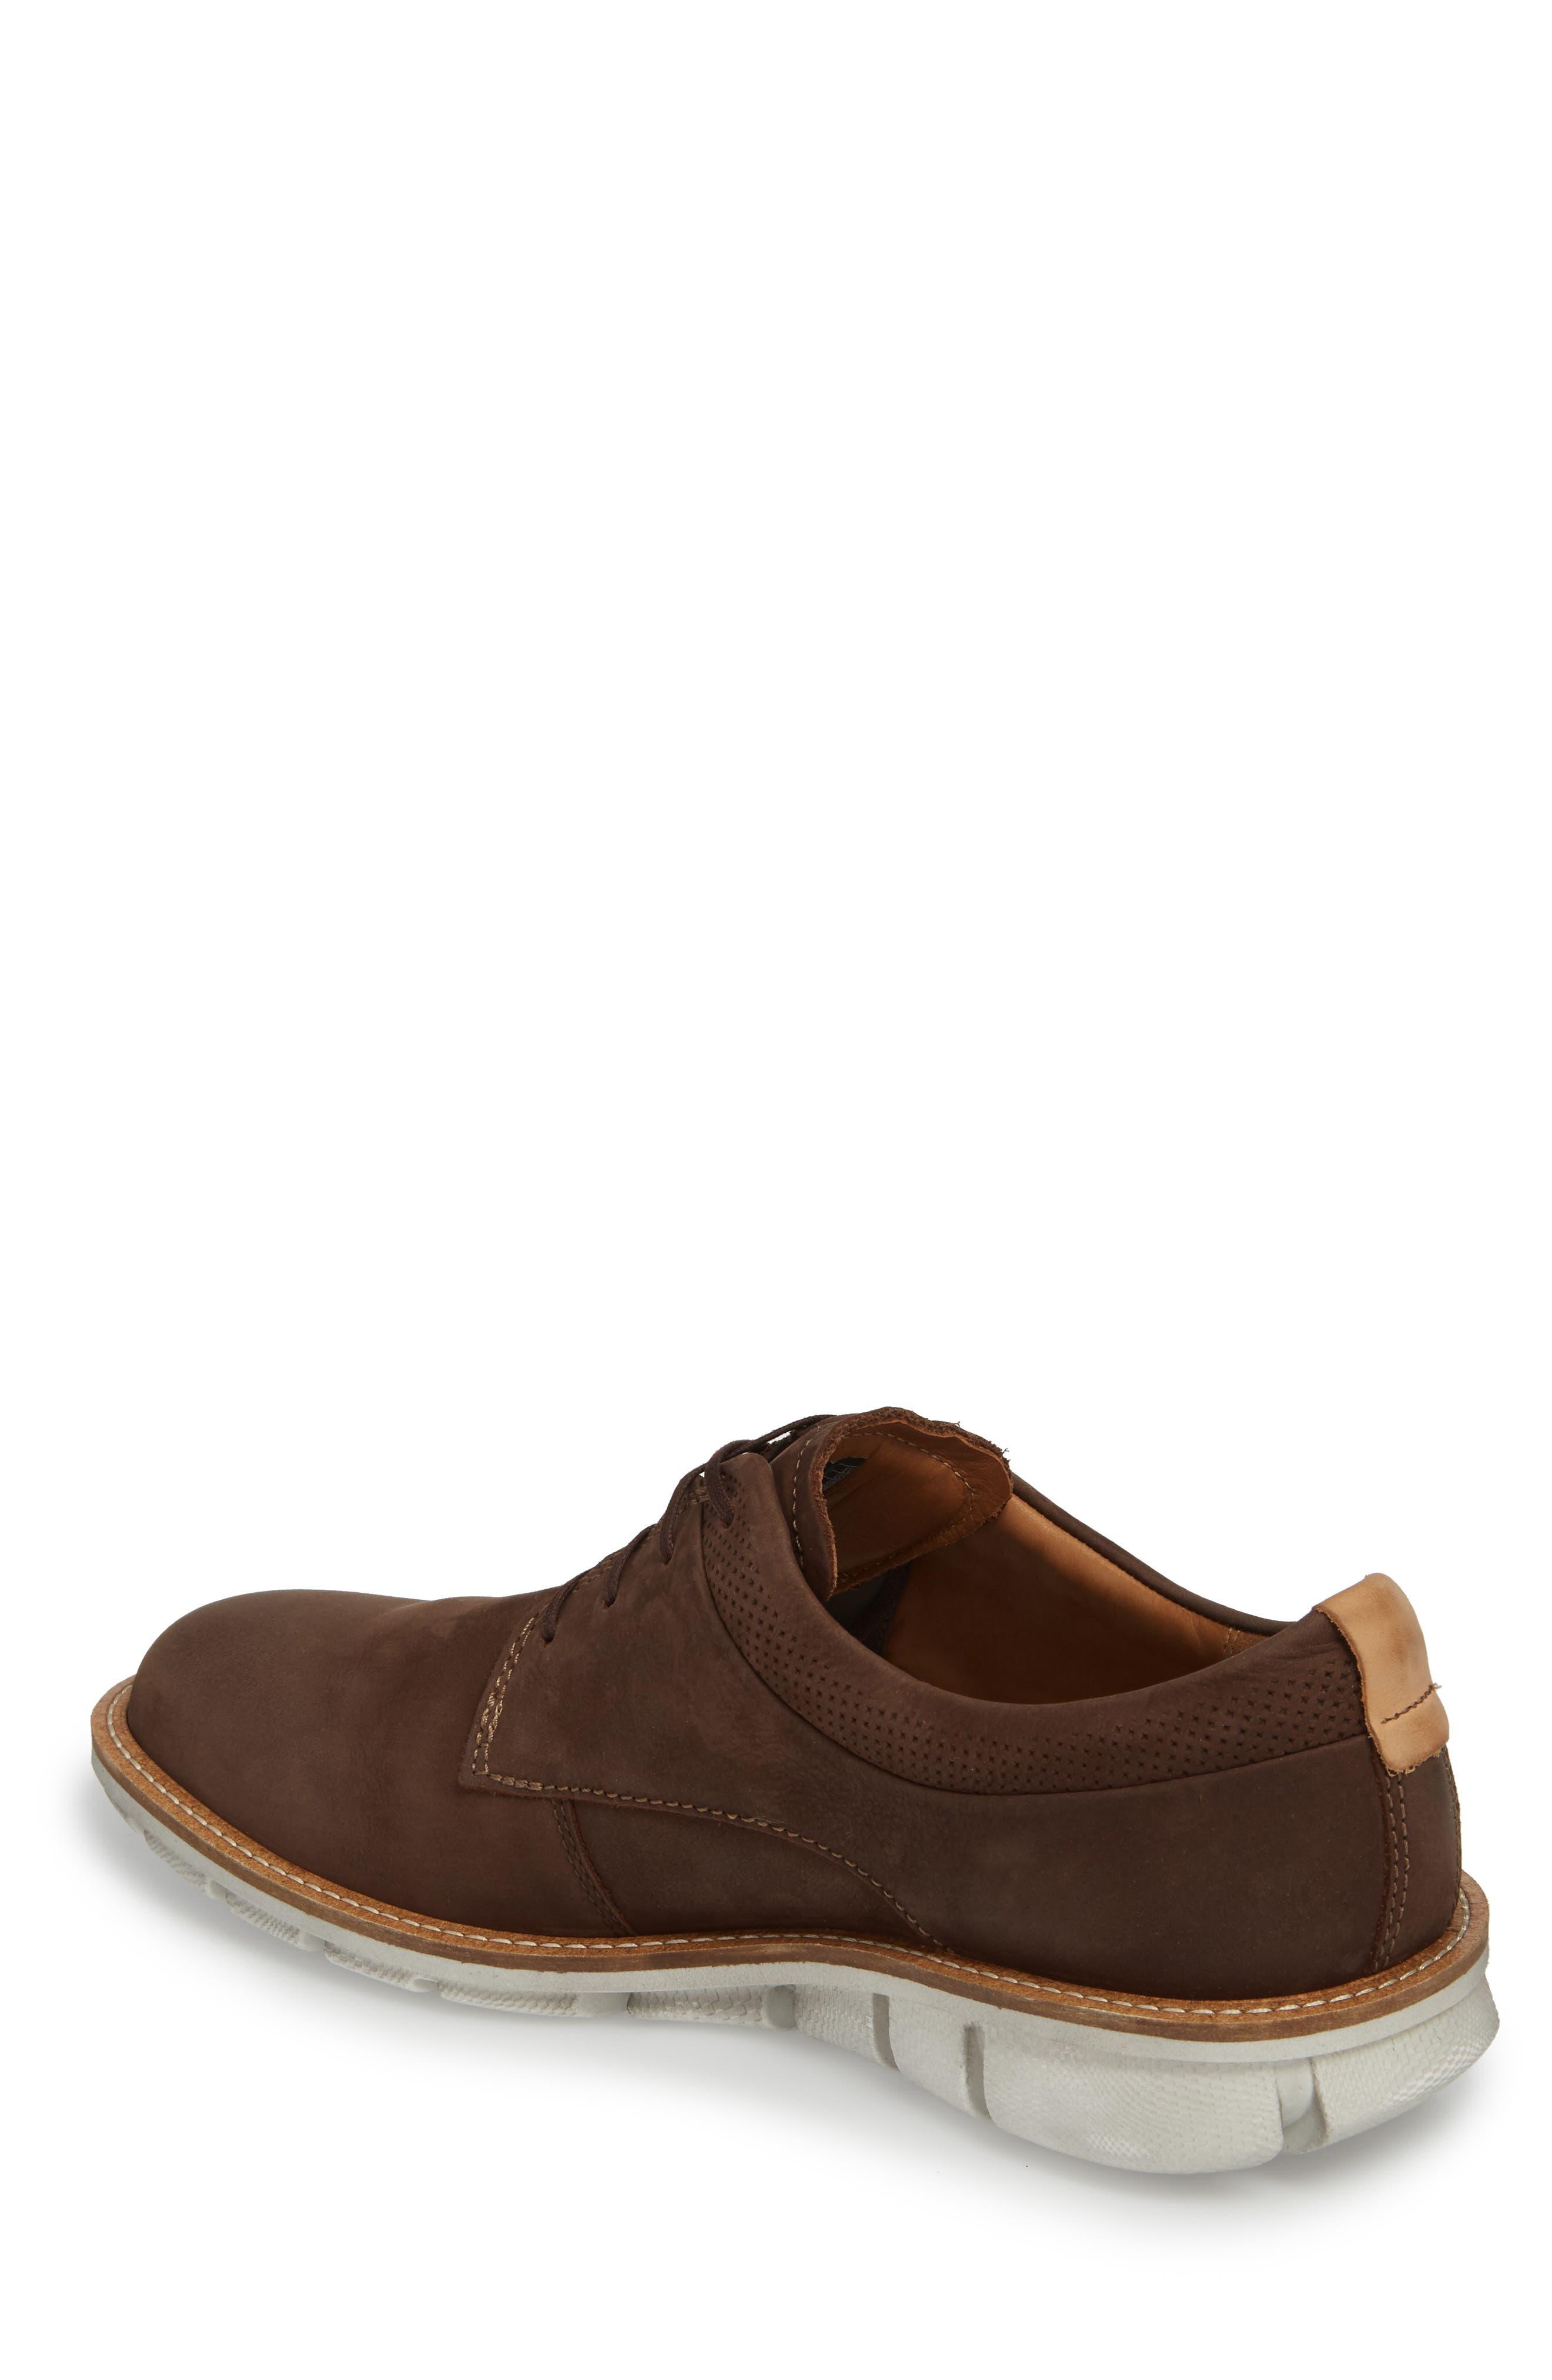 Jeremy Hybrid Plain Toe Derby,                             Alternate thumbnail 2, color,                             Coffee Leather